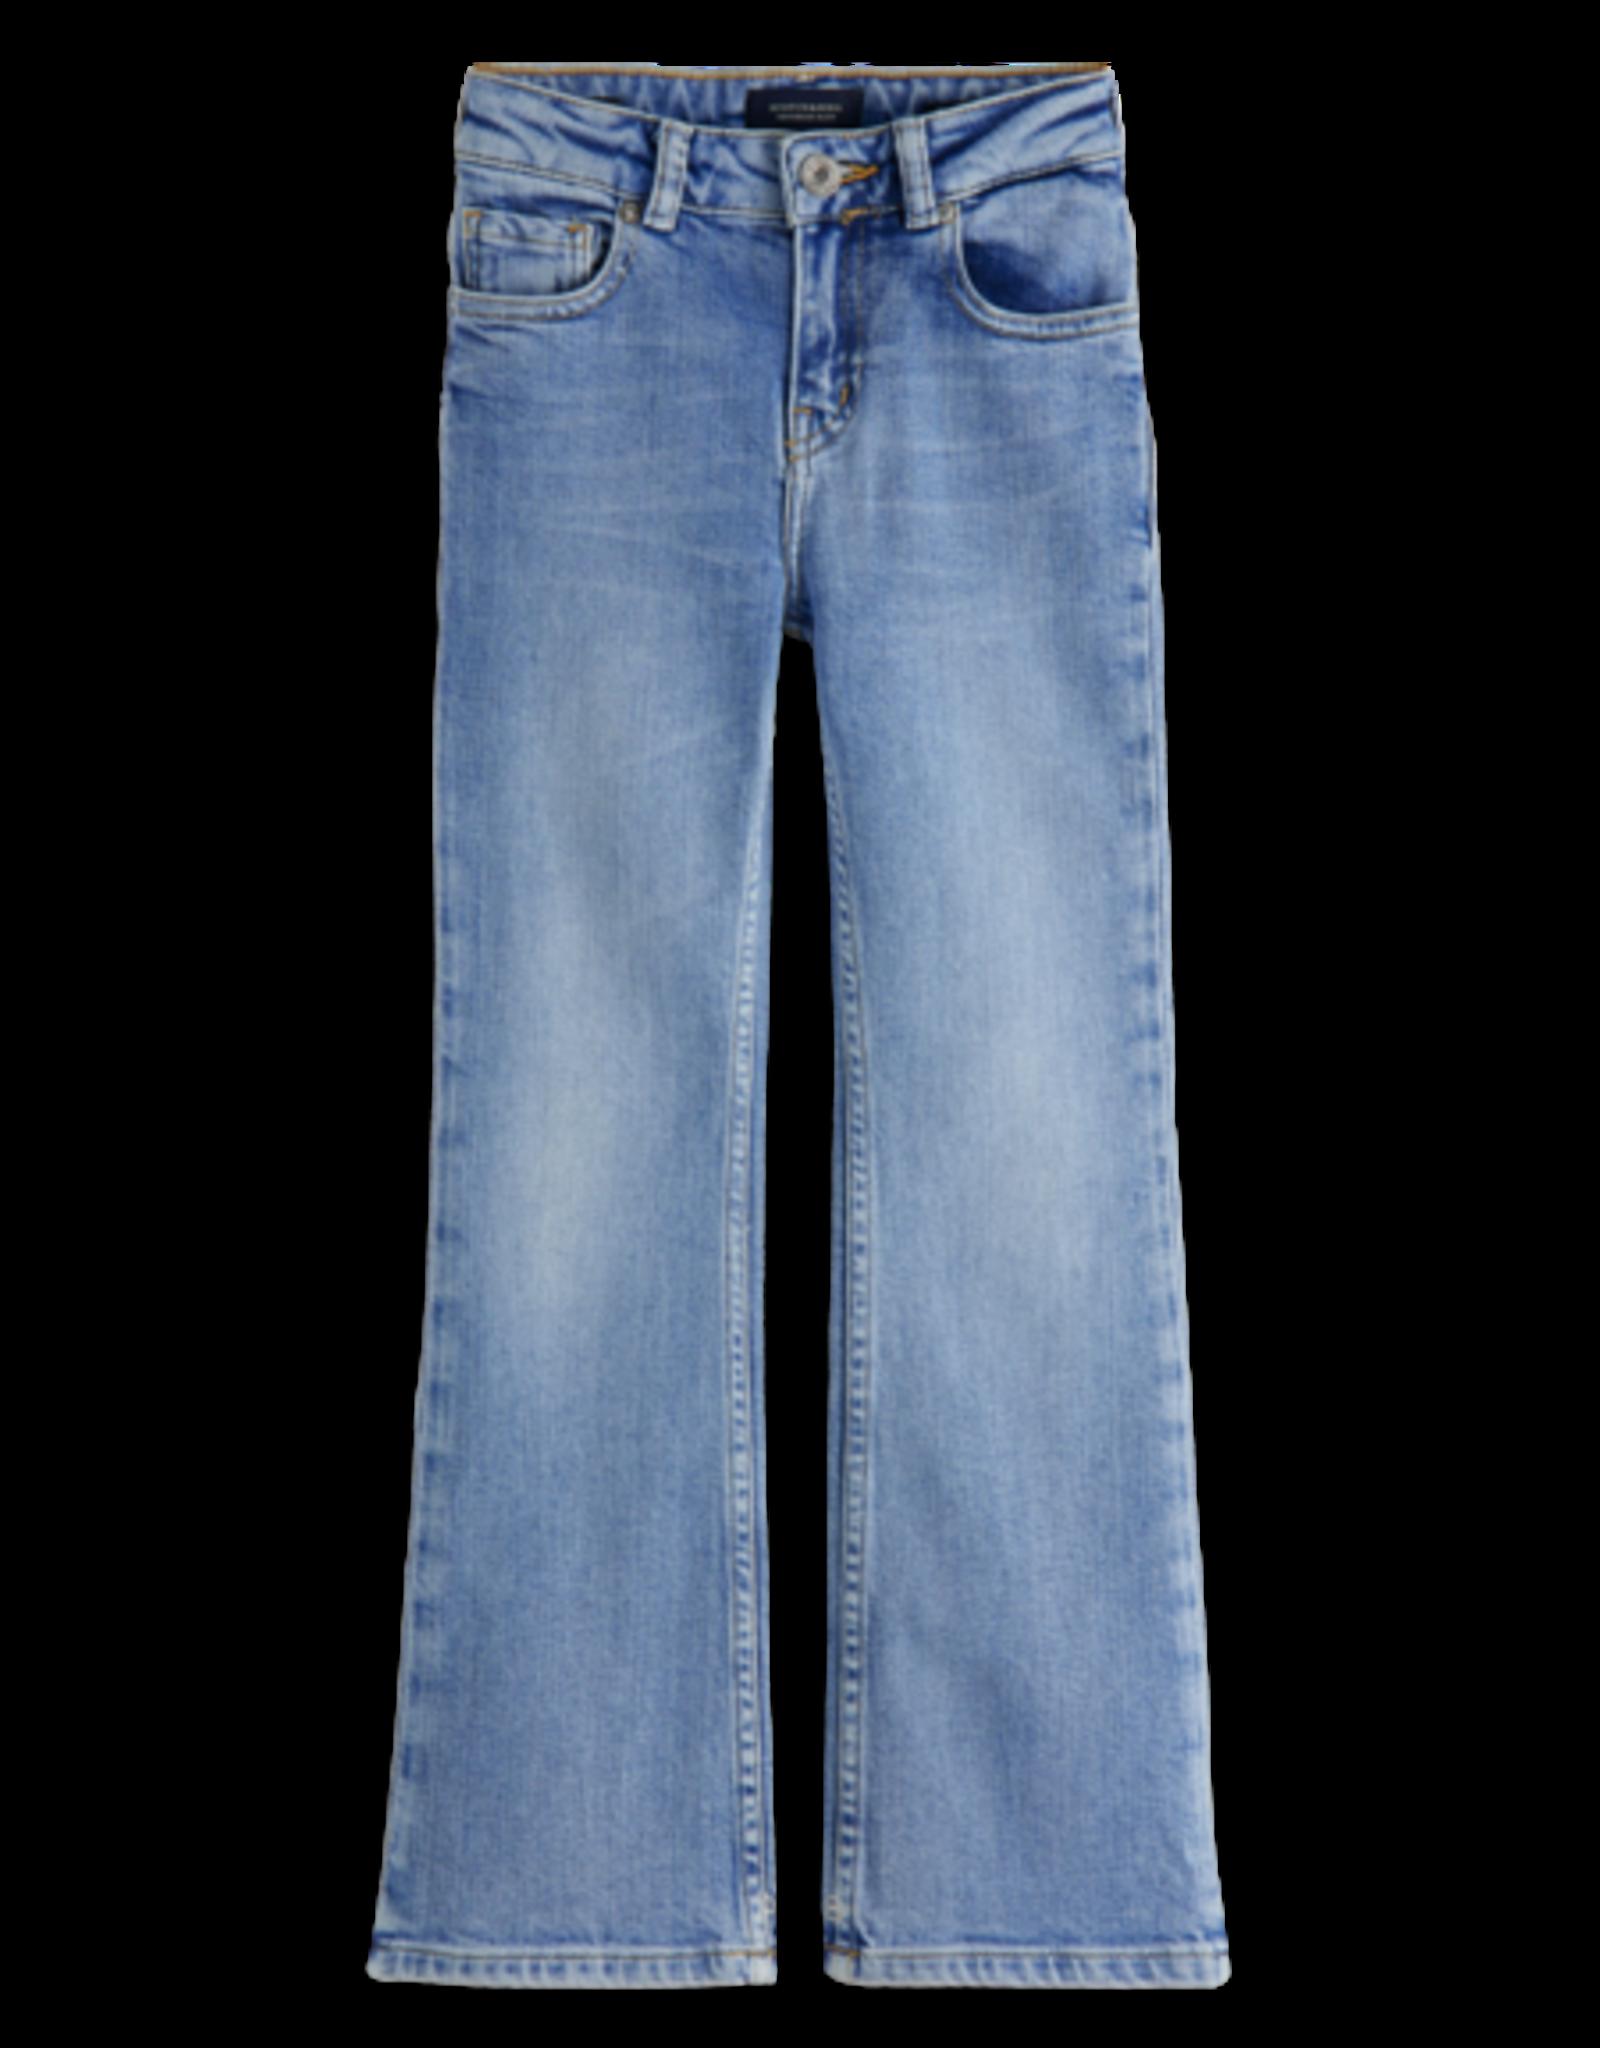 Scotch & Soda Scotch & Soda The Charm blauwe flared jeans Crystal Clear